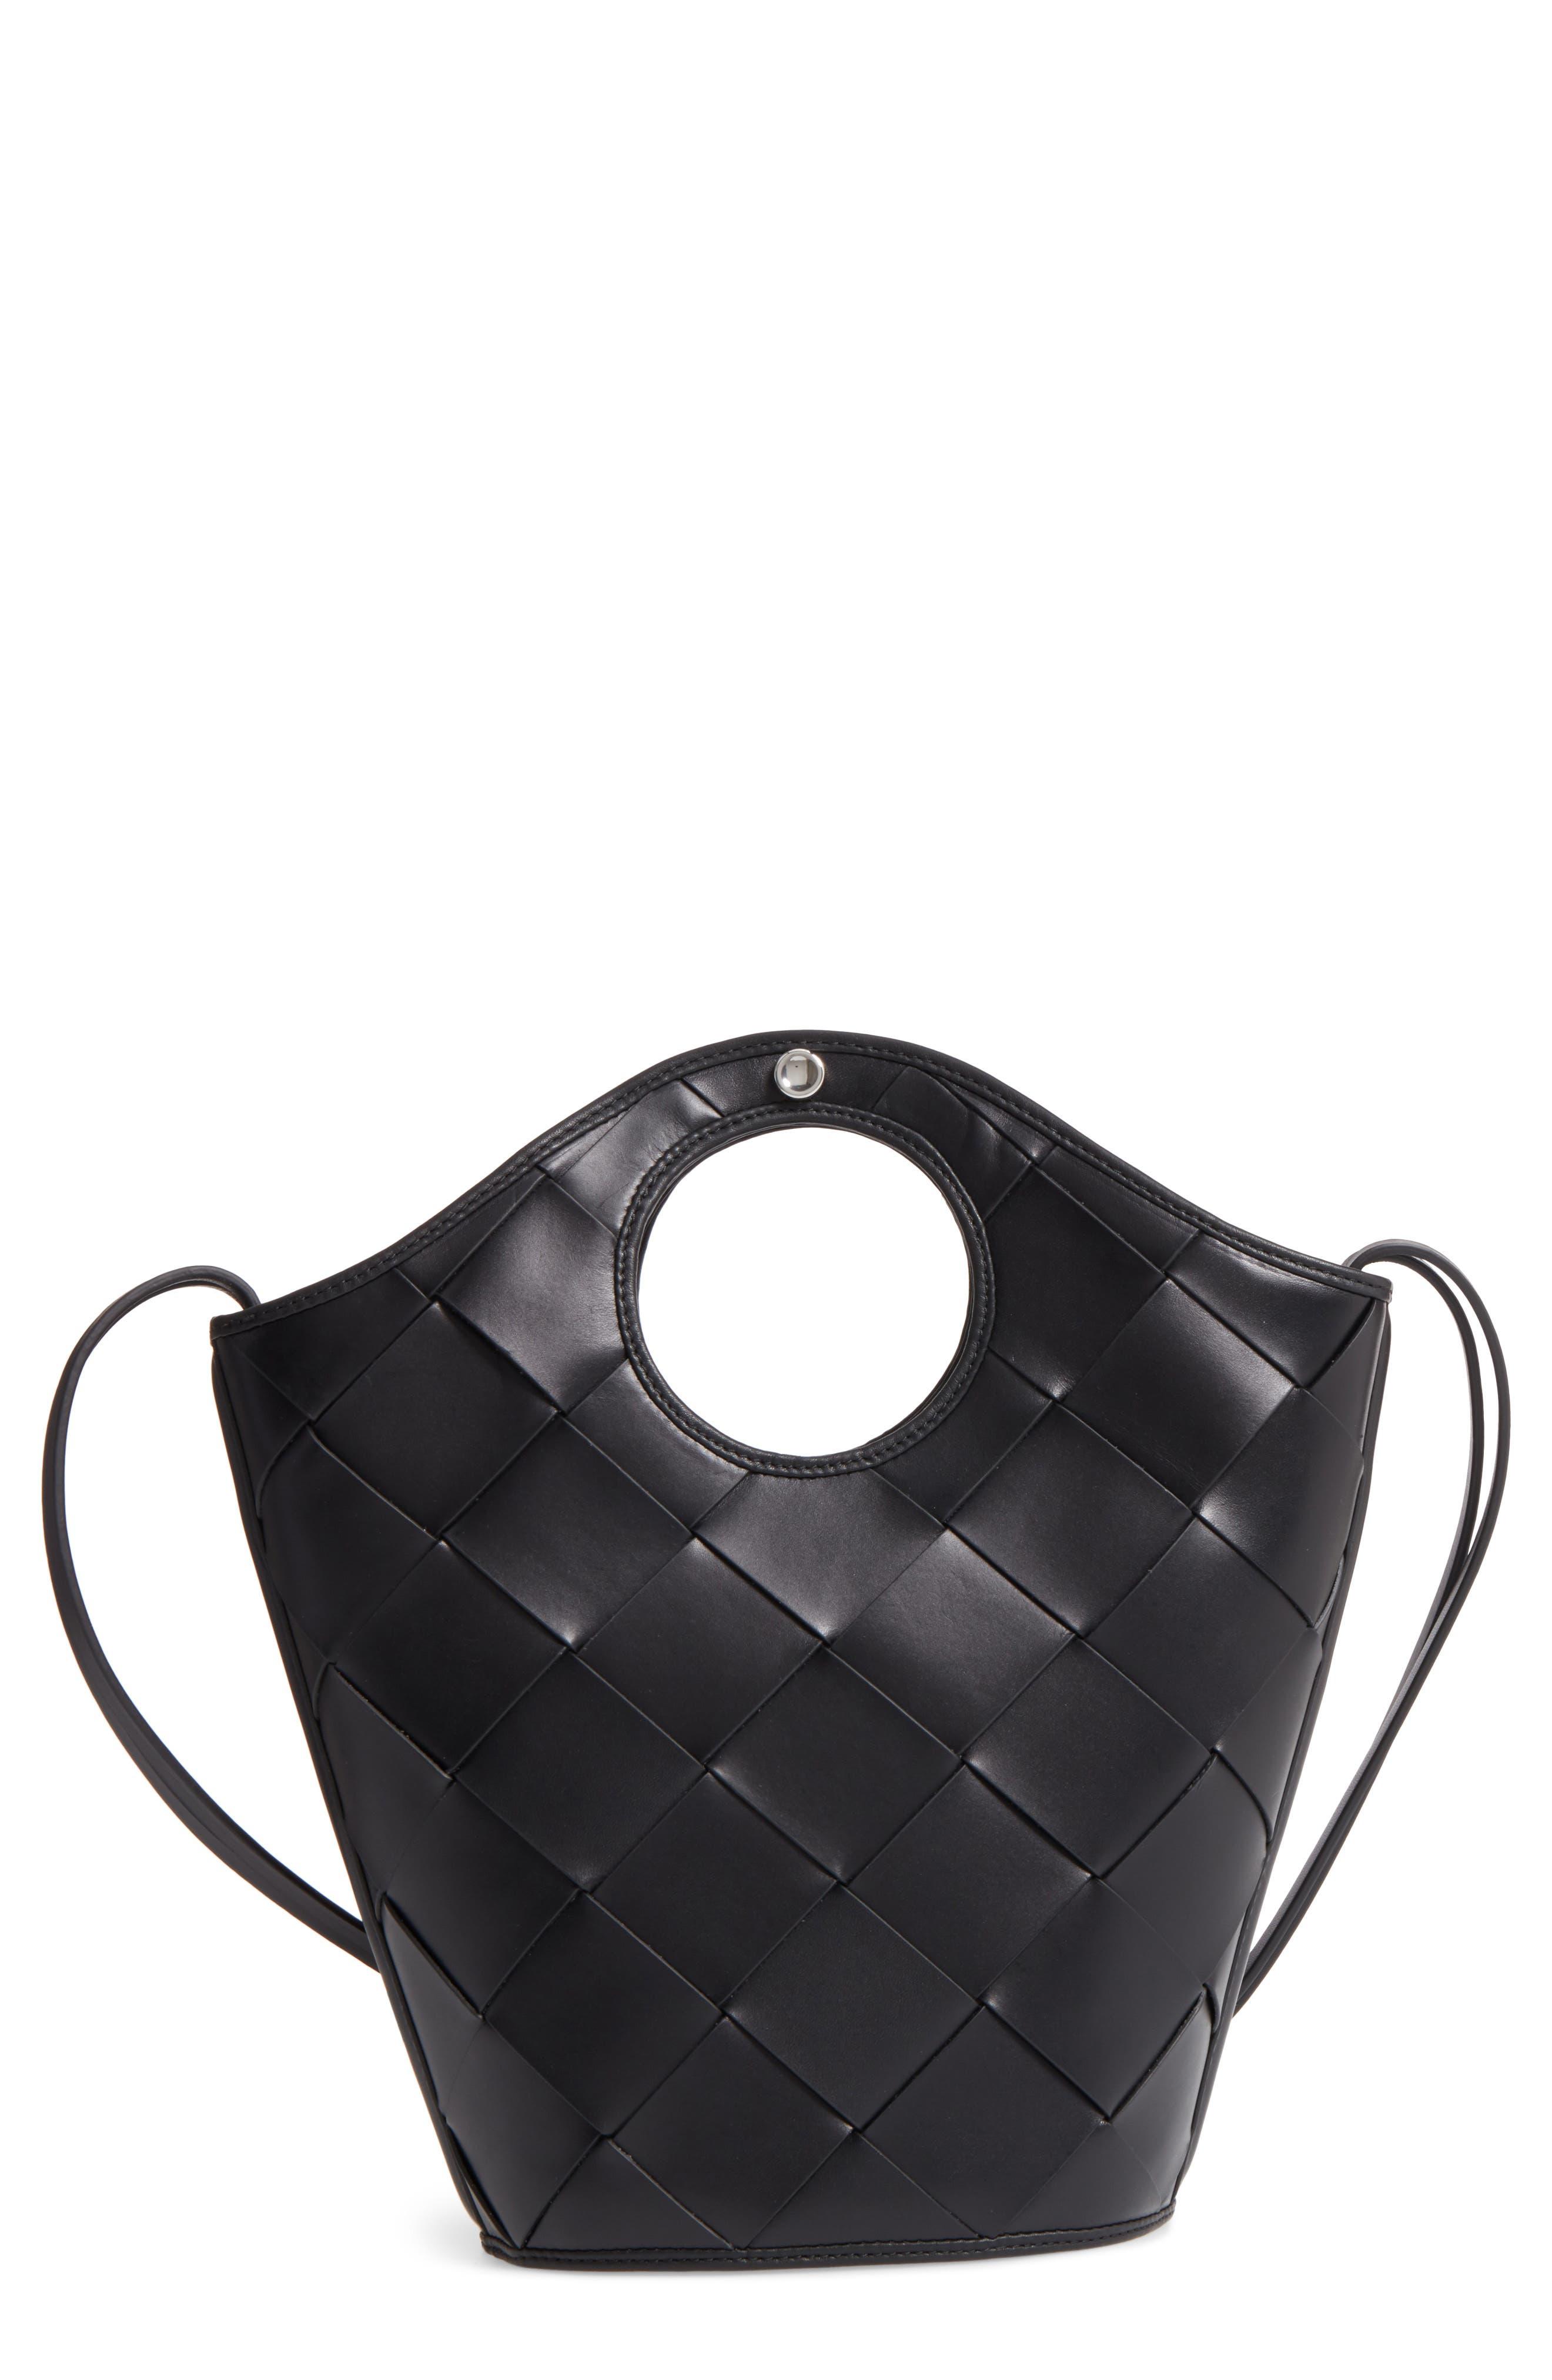 Main Image - Elizabeth and James Small Market Woven Leather Crossbody Shopper